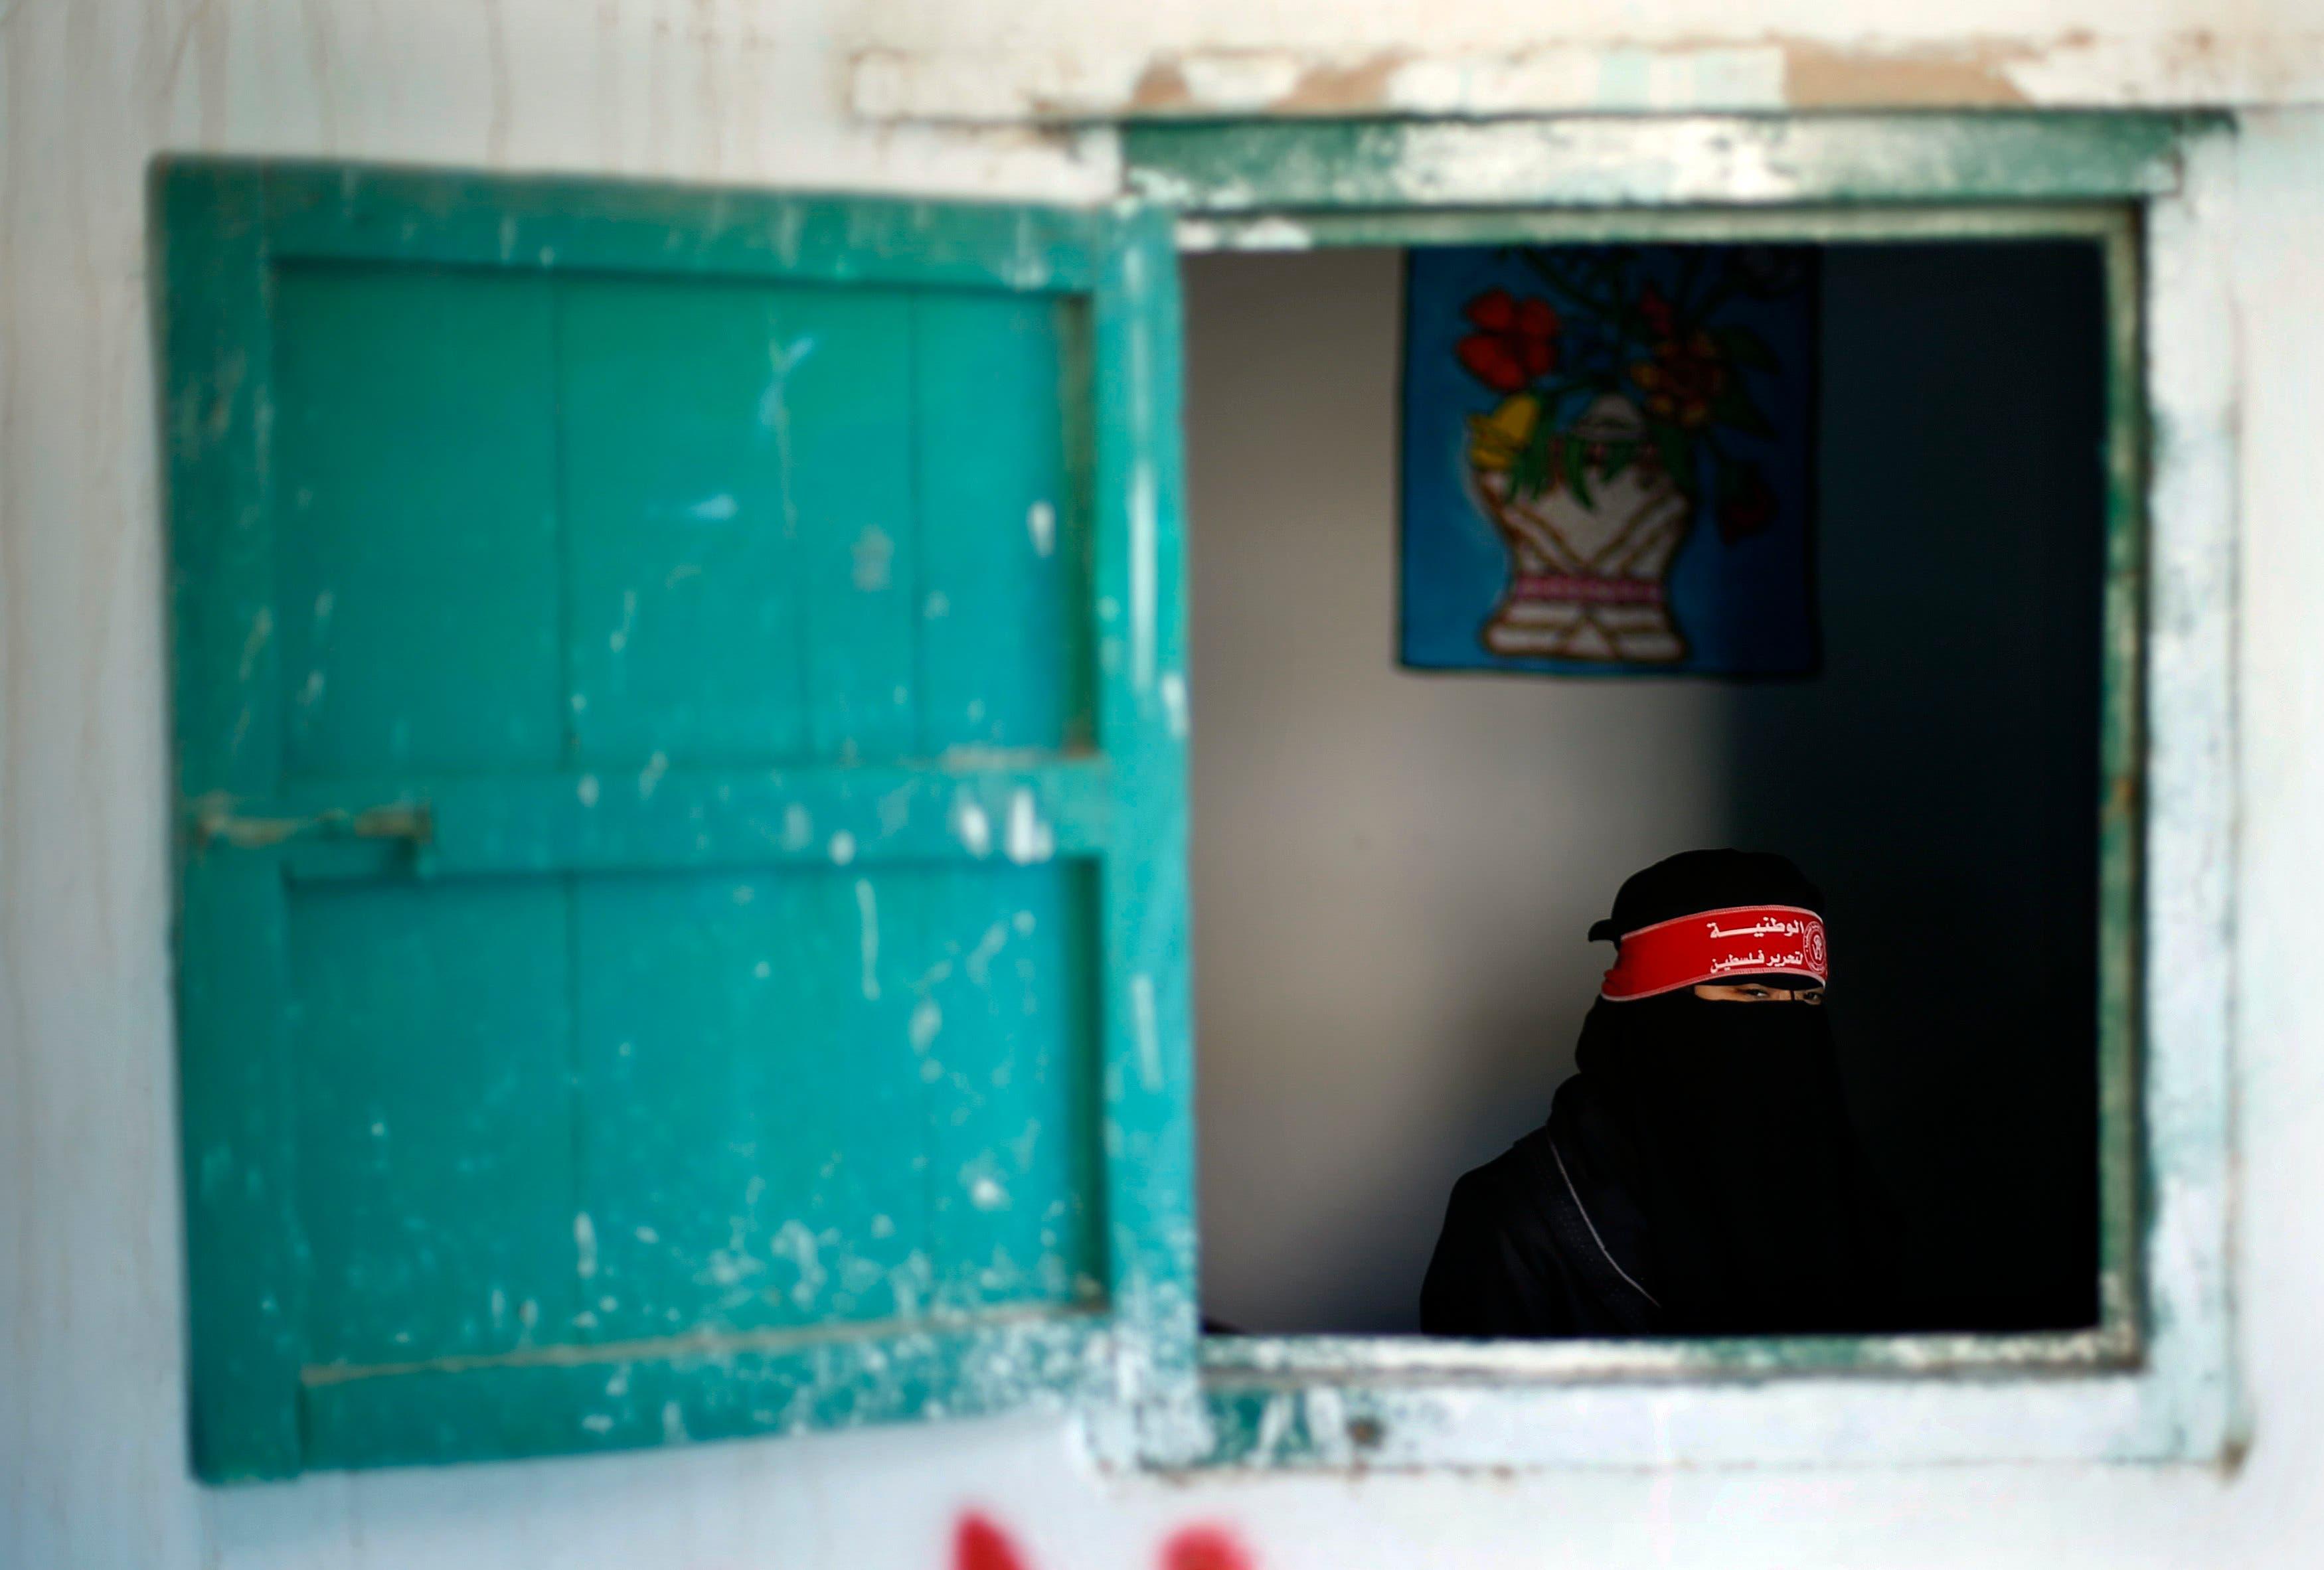 Palestinian women take up arms